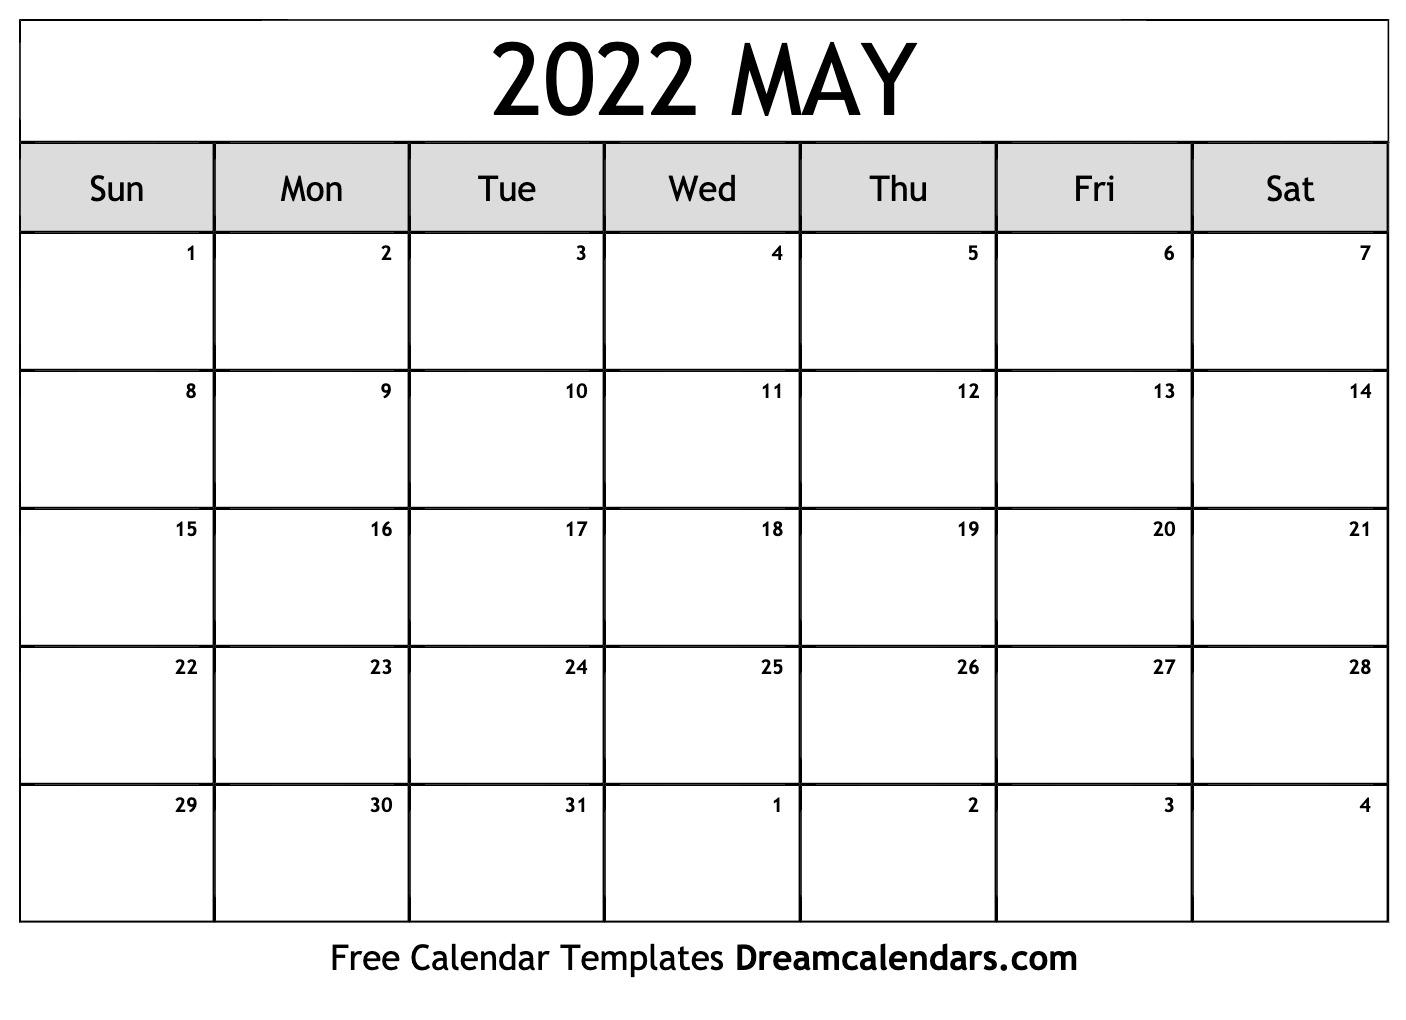 May 2022 Calendar | Free Blank Printable Templates for 2022 Sunrise And Sunset Calendar